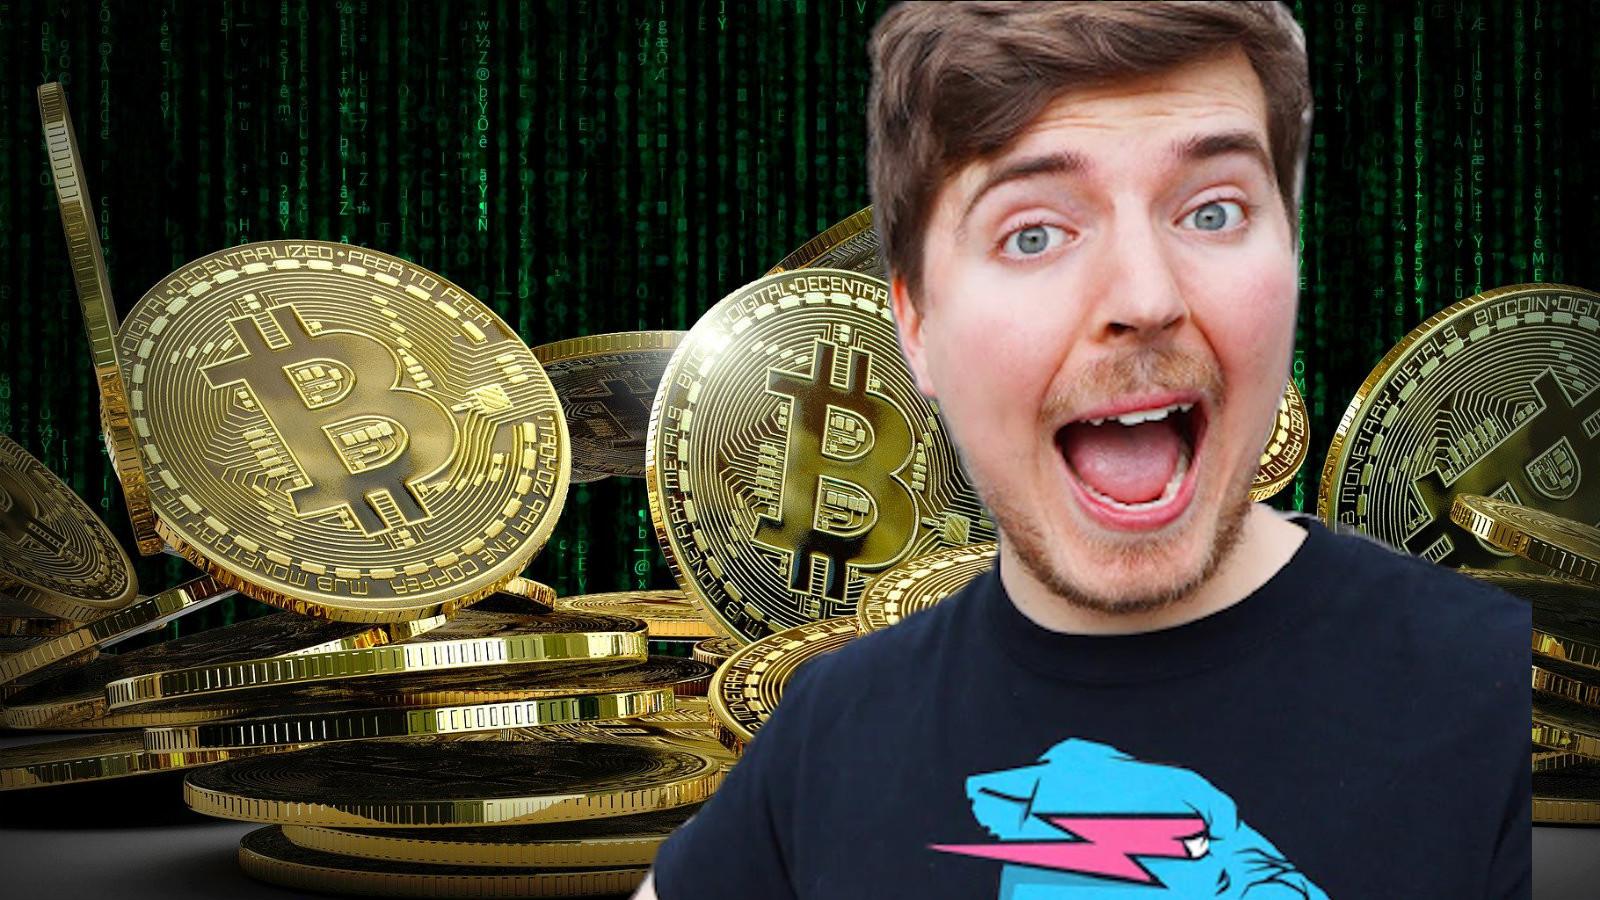 Mr Beast and Bitcoin